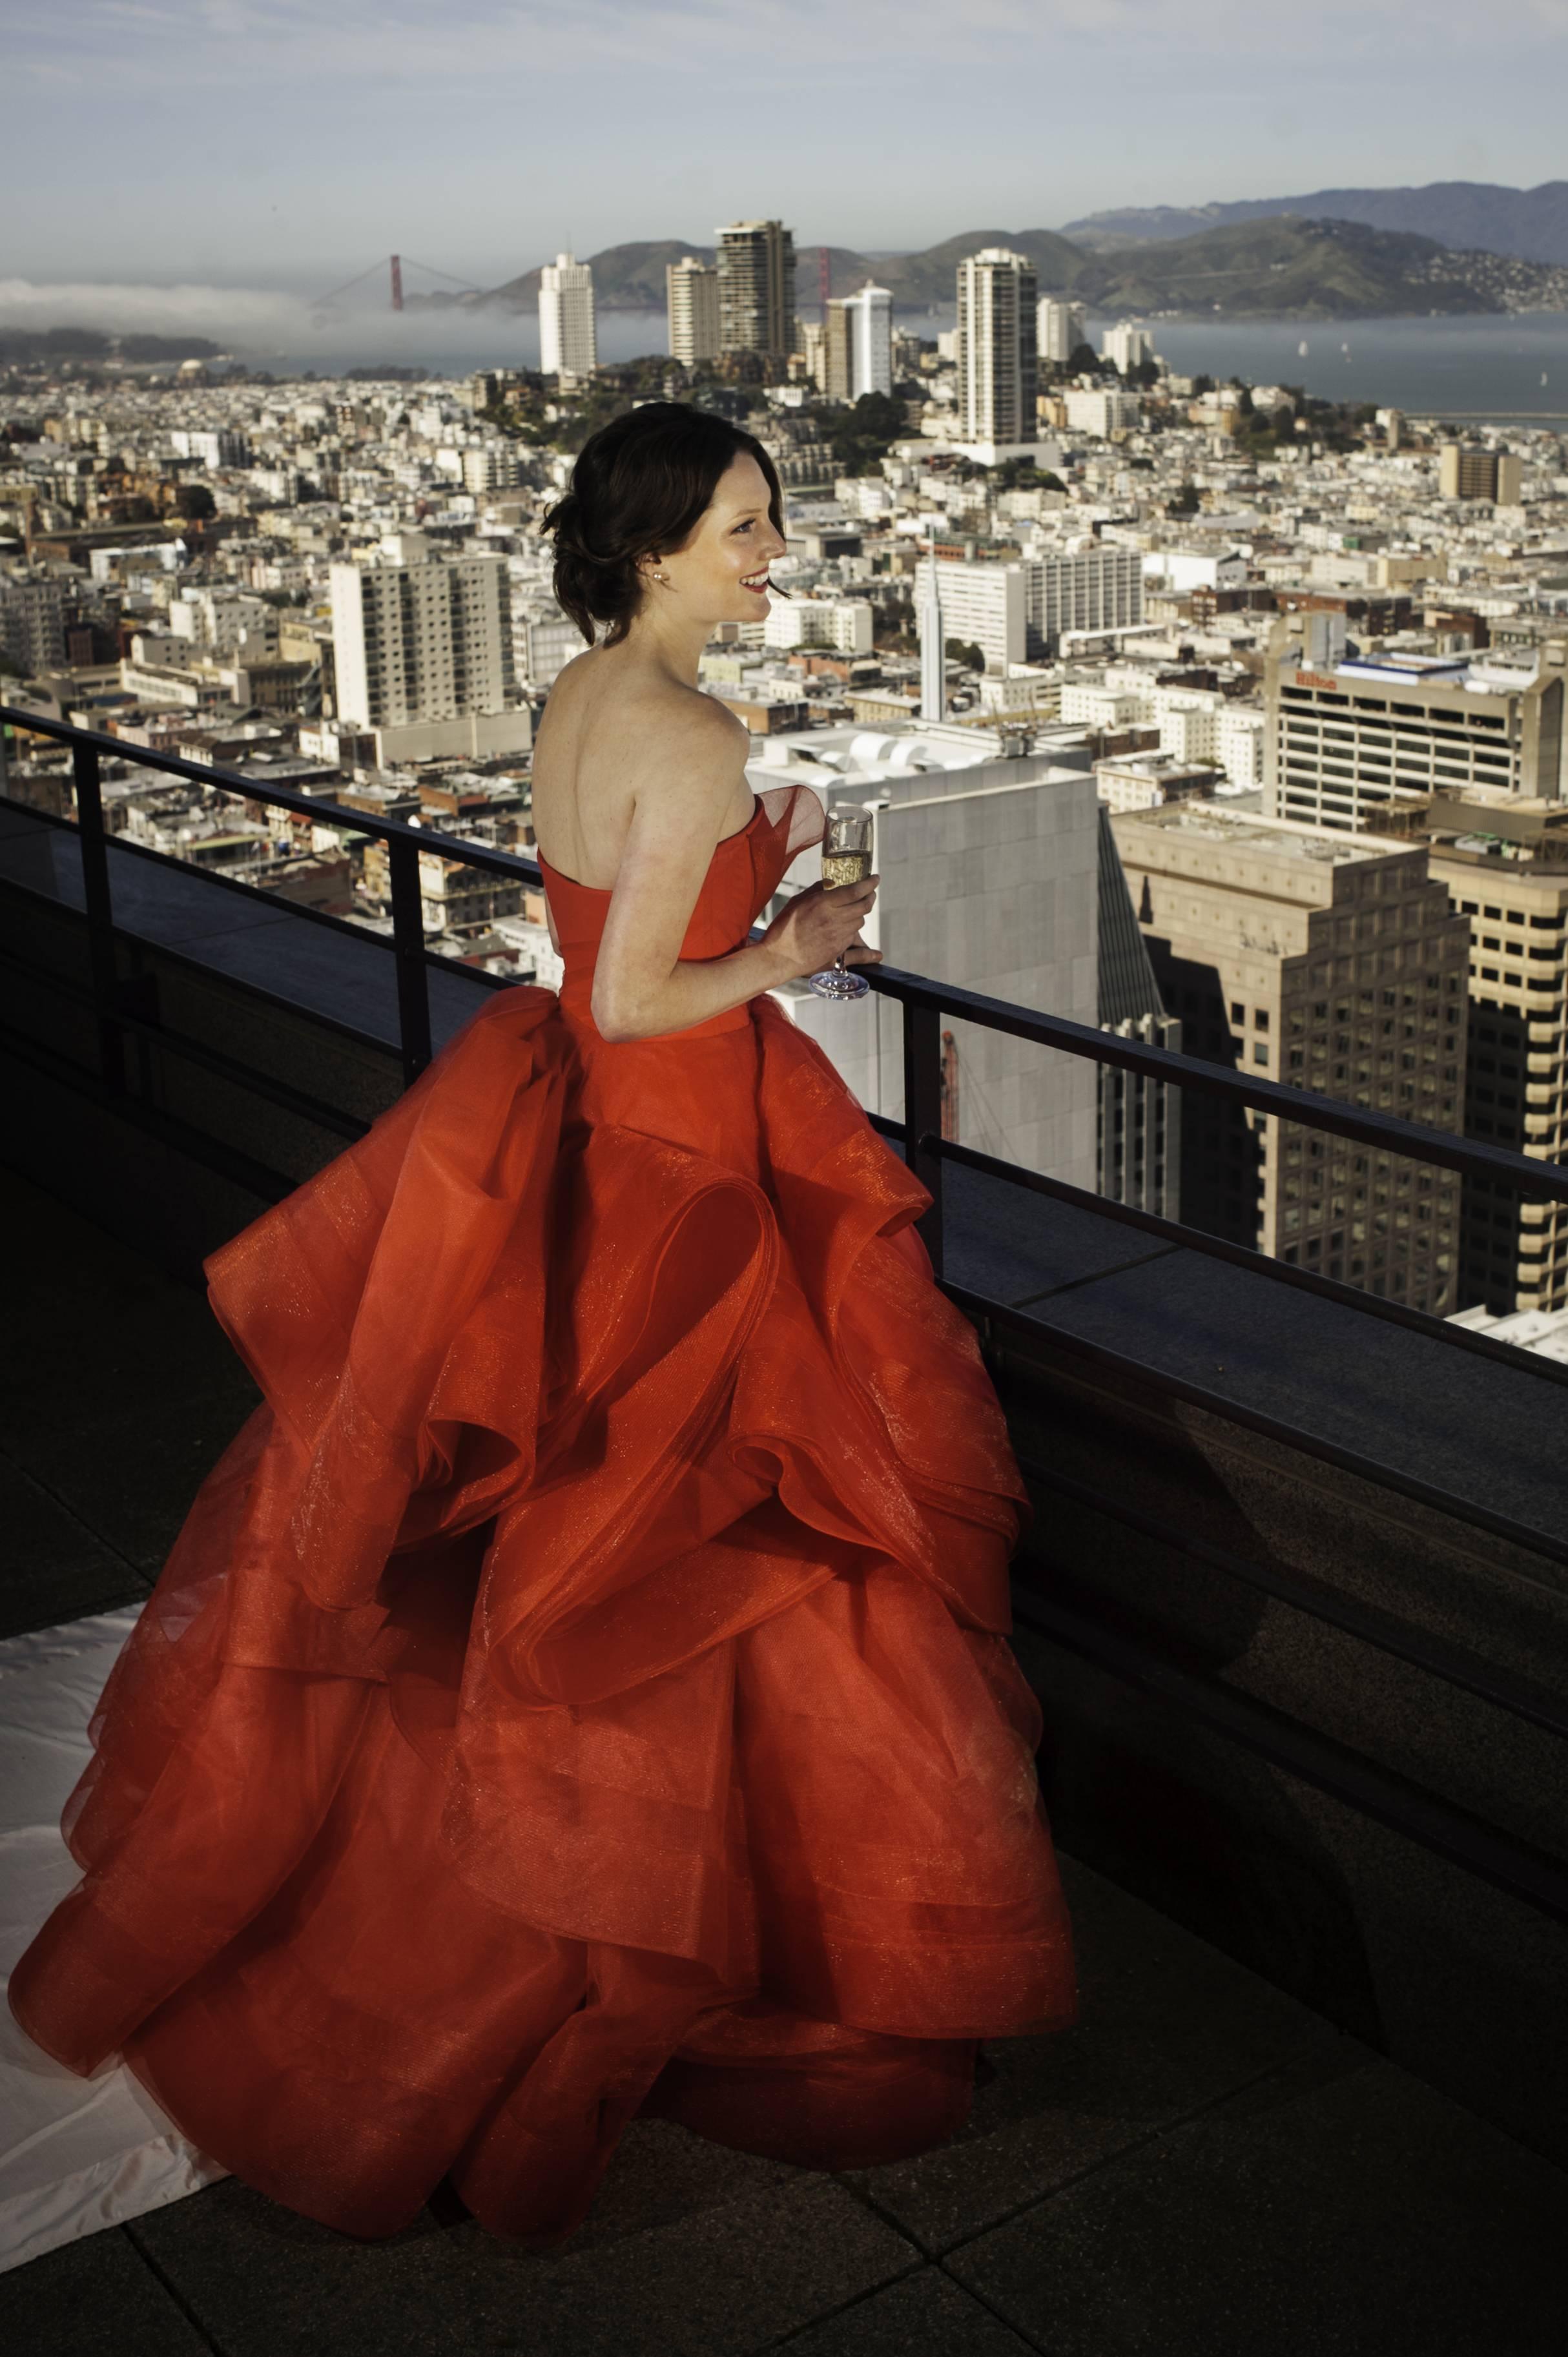 Mandarin Oriental Hosts Bridal Event to Benefit Charity - Haute Living